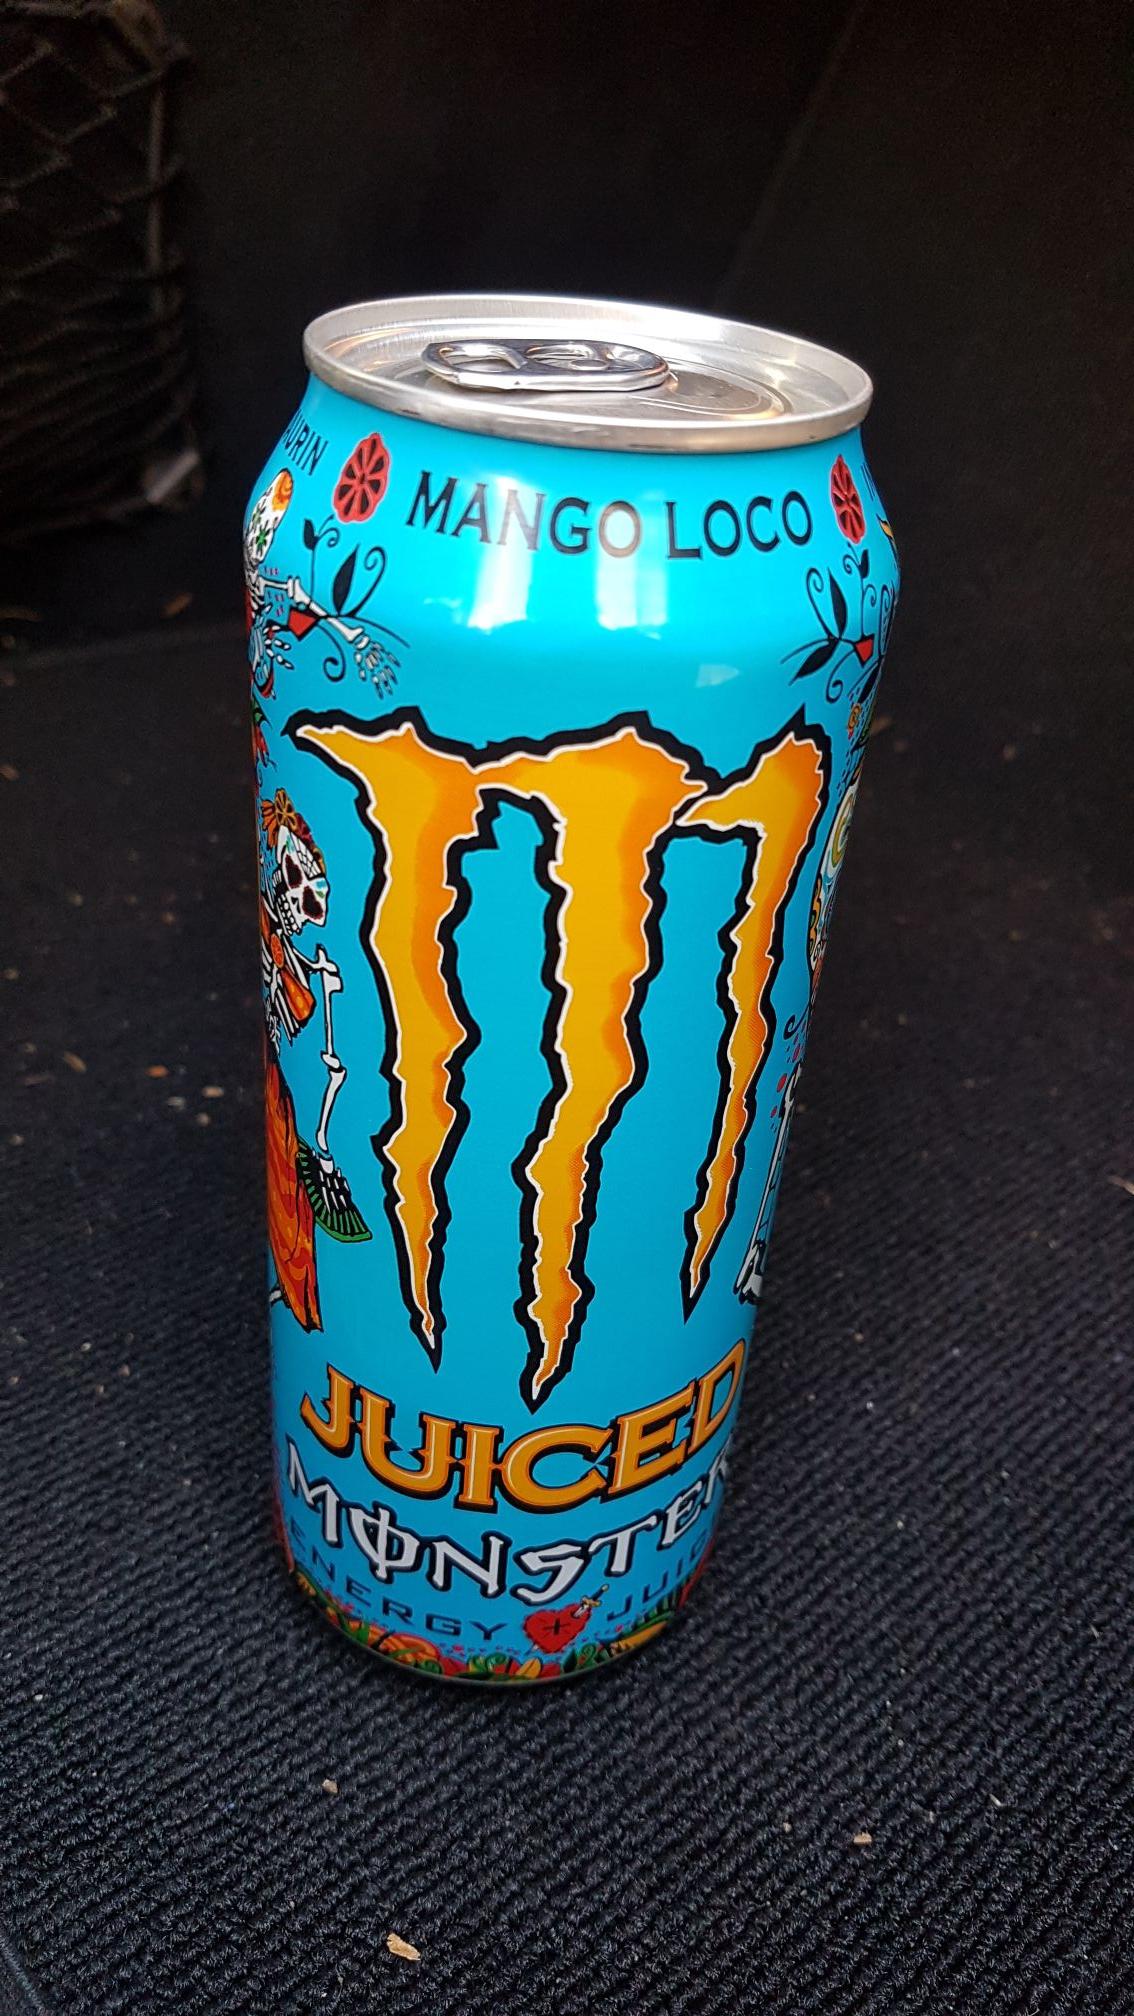 (Aldi Süd) Monster Energy original grün oder Juiced Mango Loco